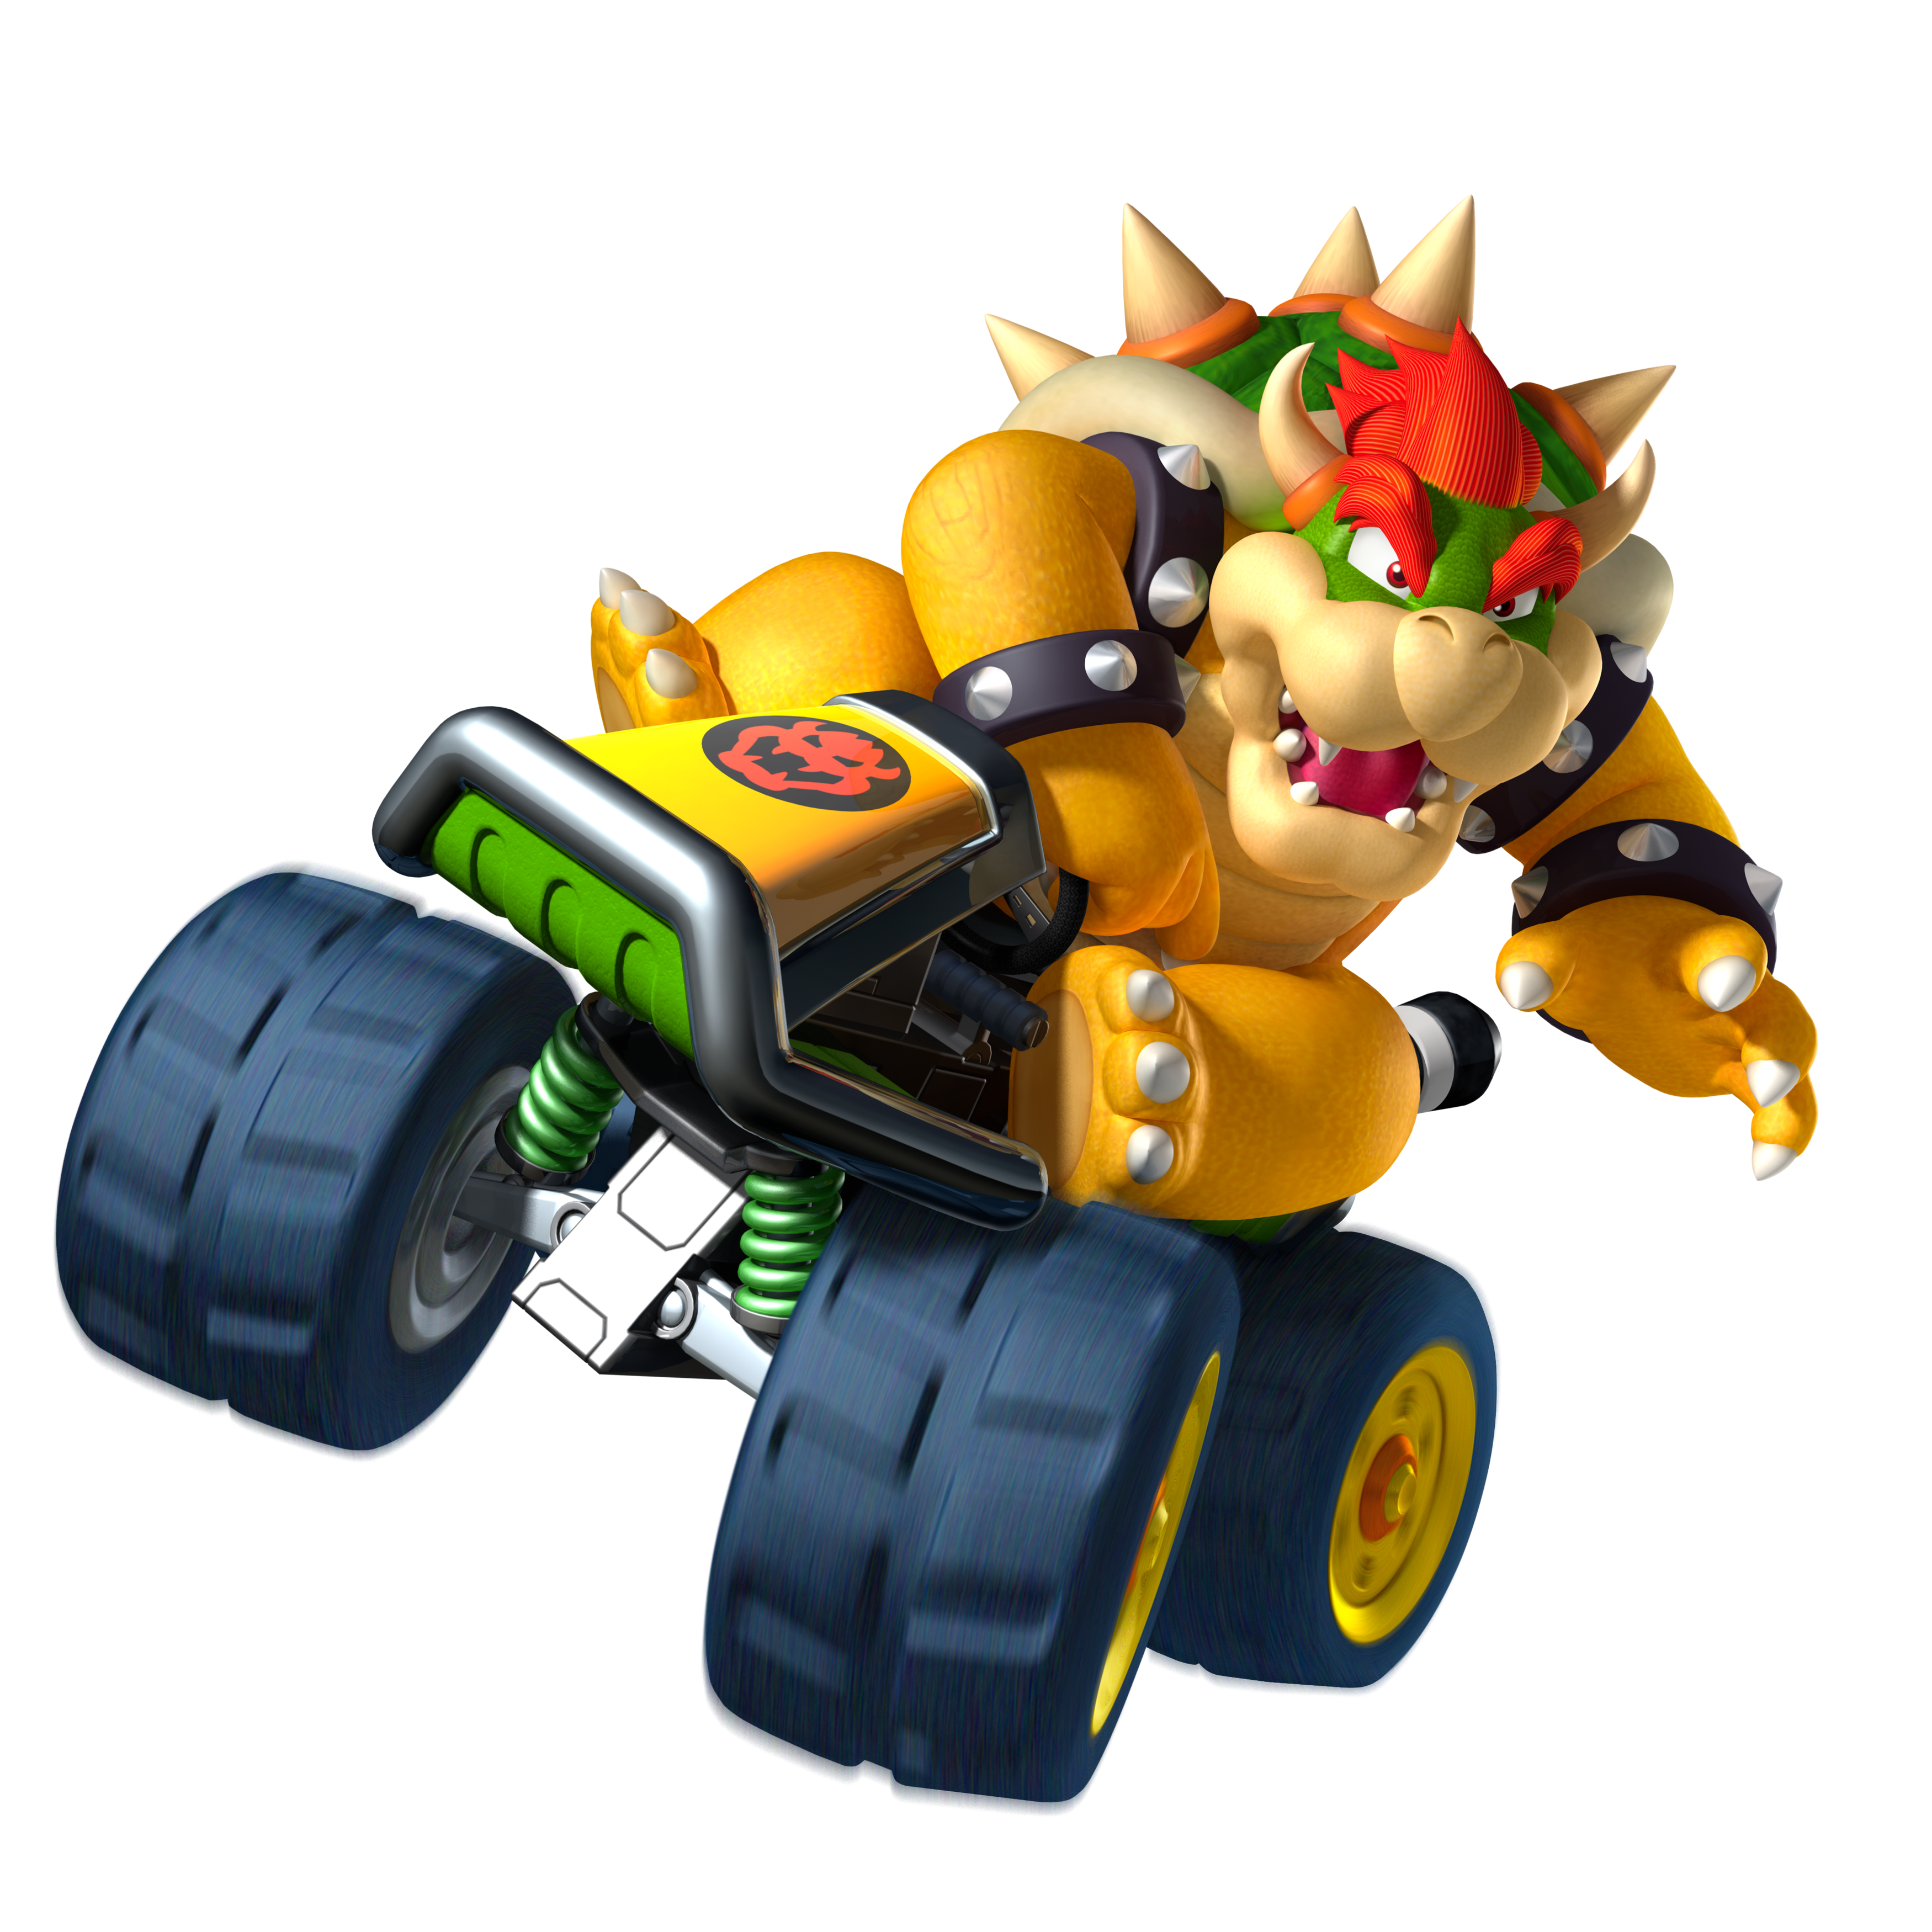 Bowser as seen in Mario Kart 7.